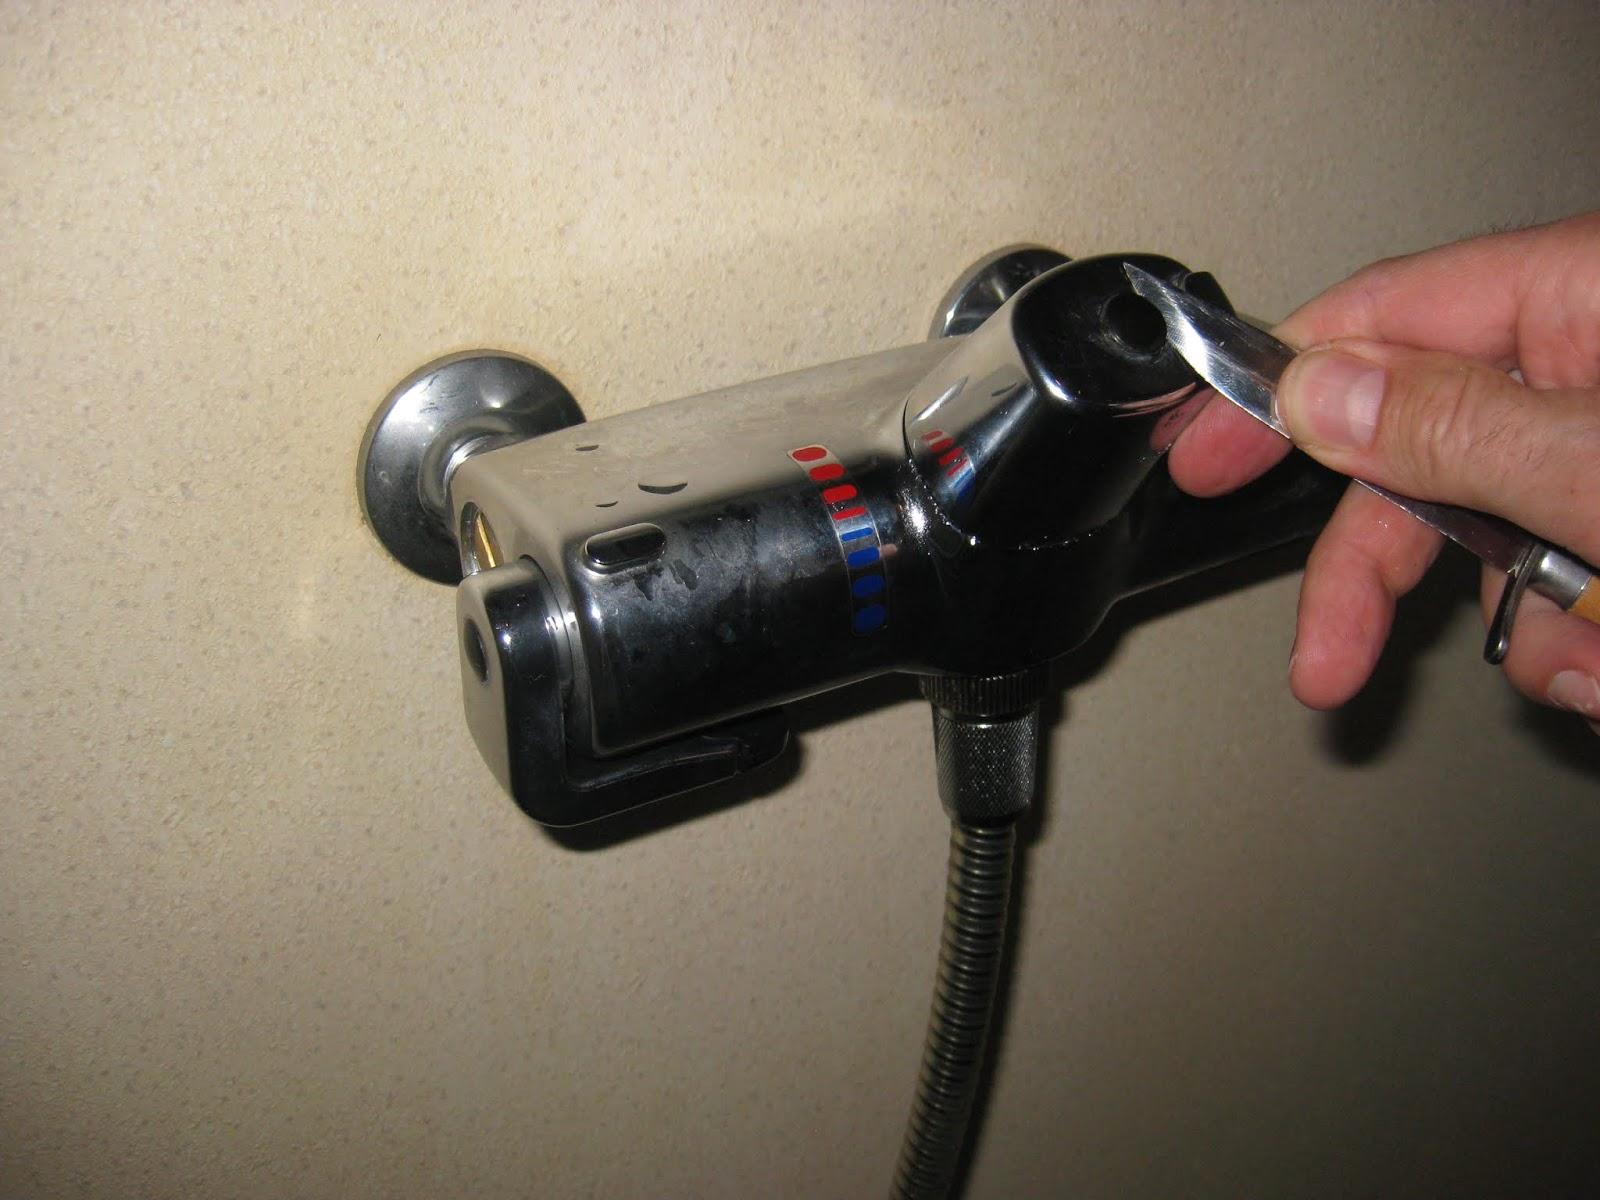 Changing the valve on Oras Optima shower faucet anno 1989 | Styrheim ...